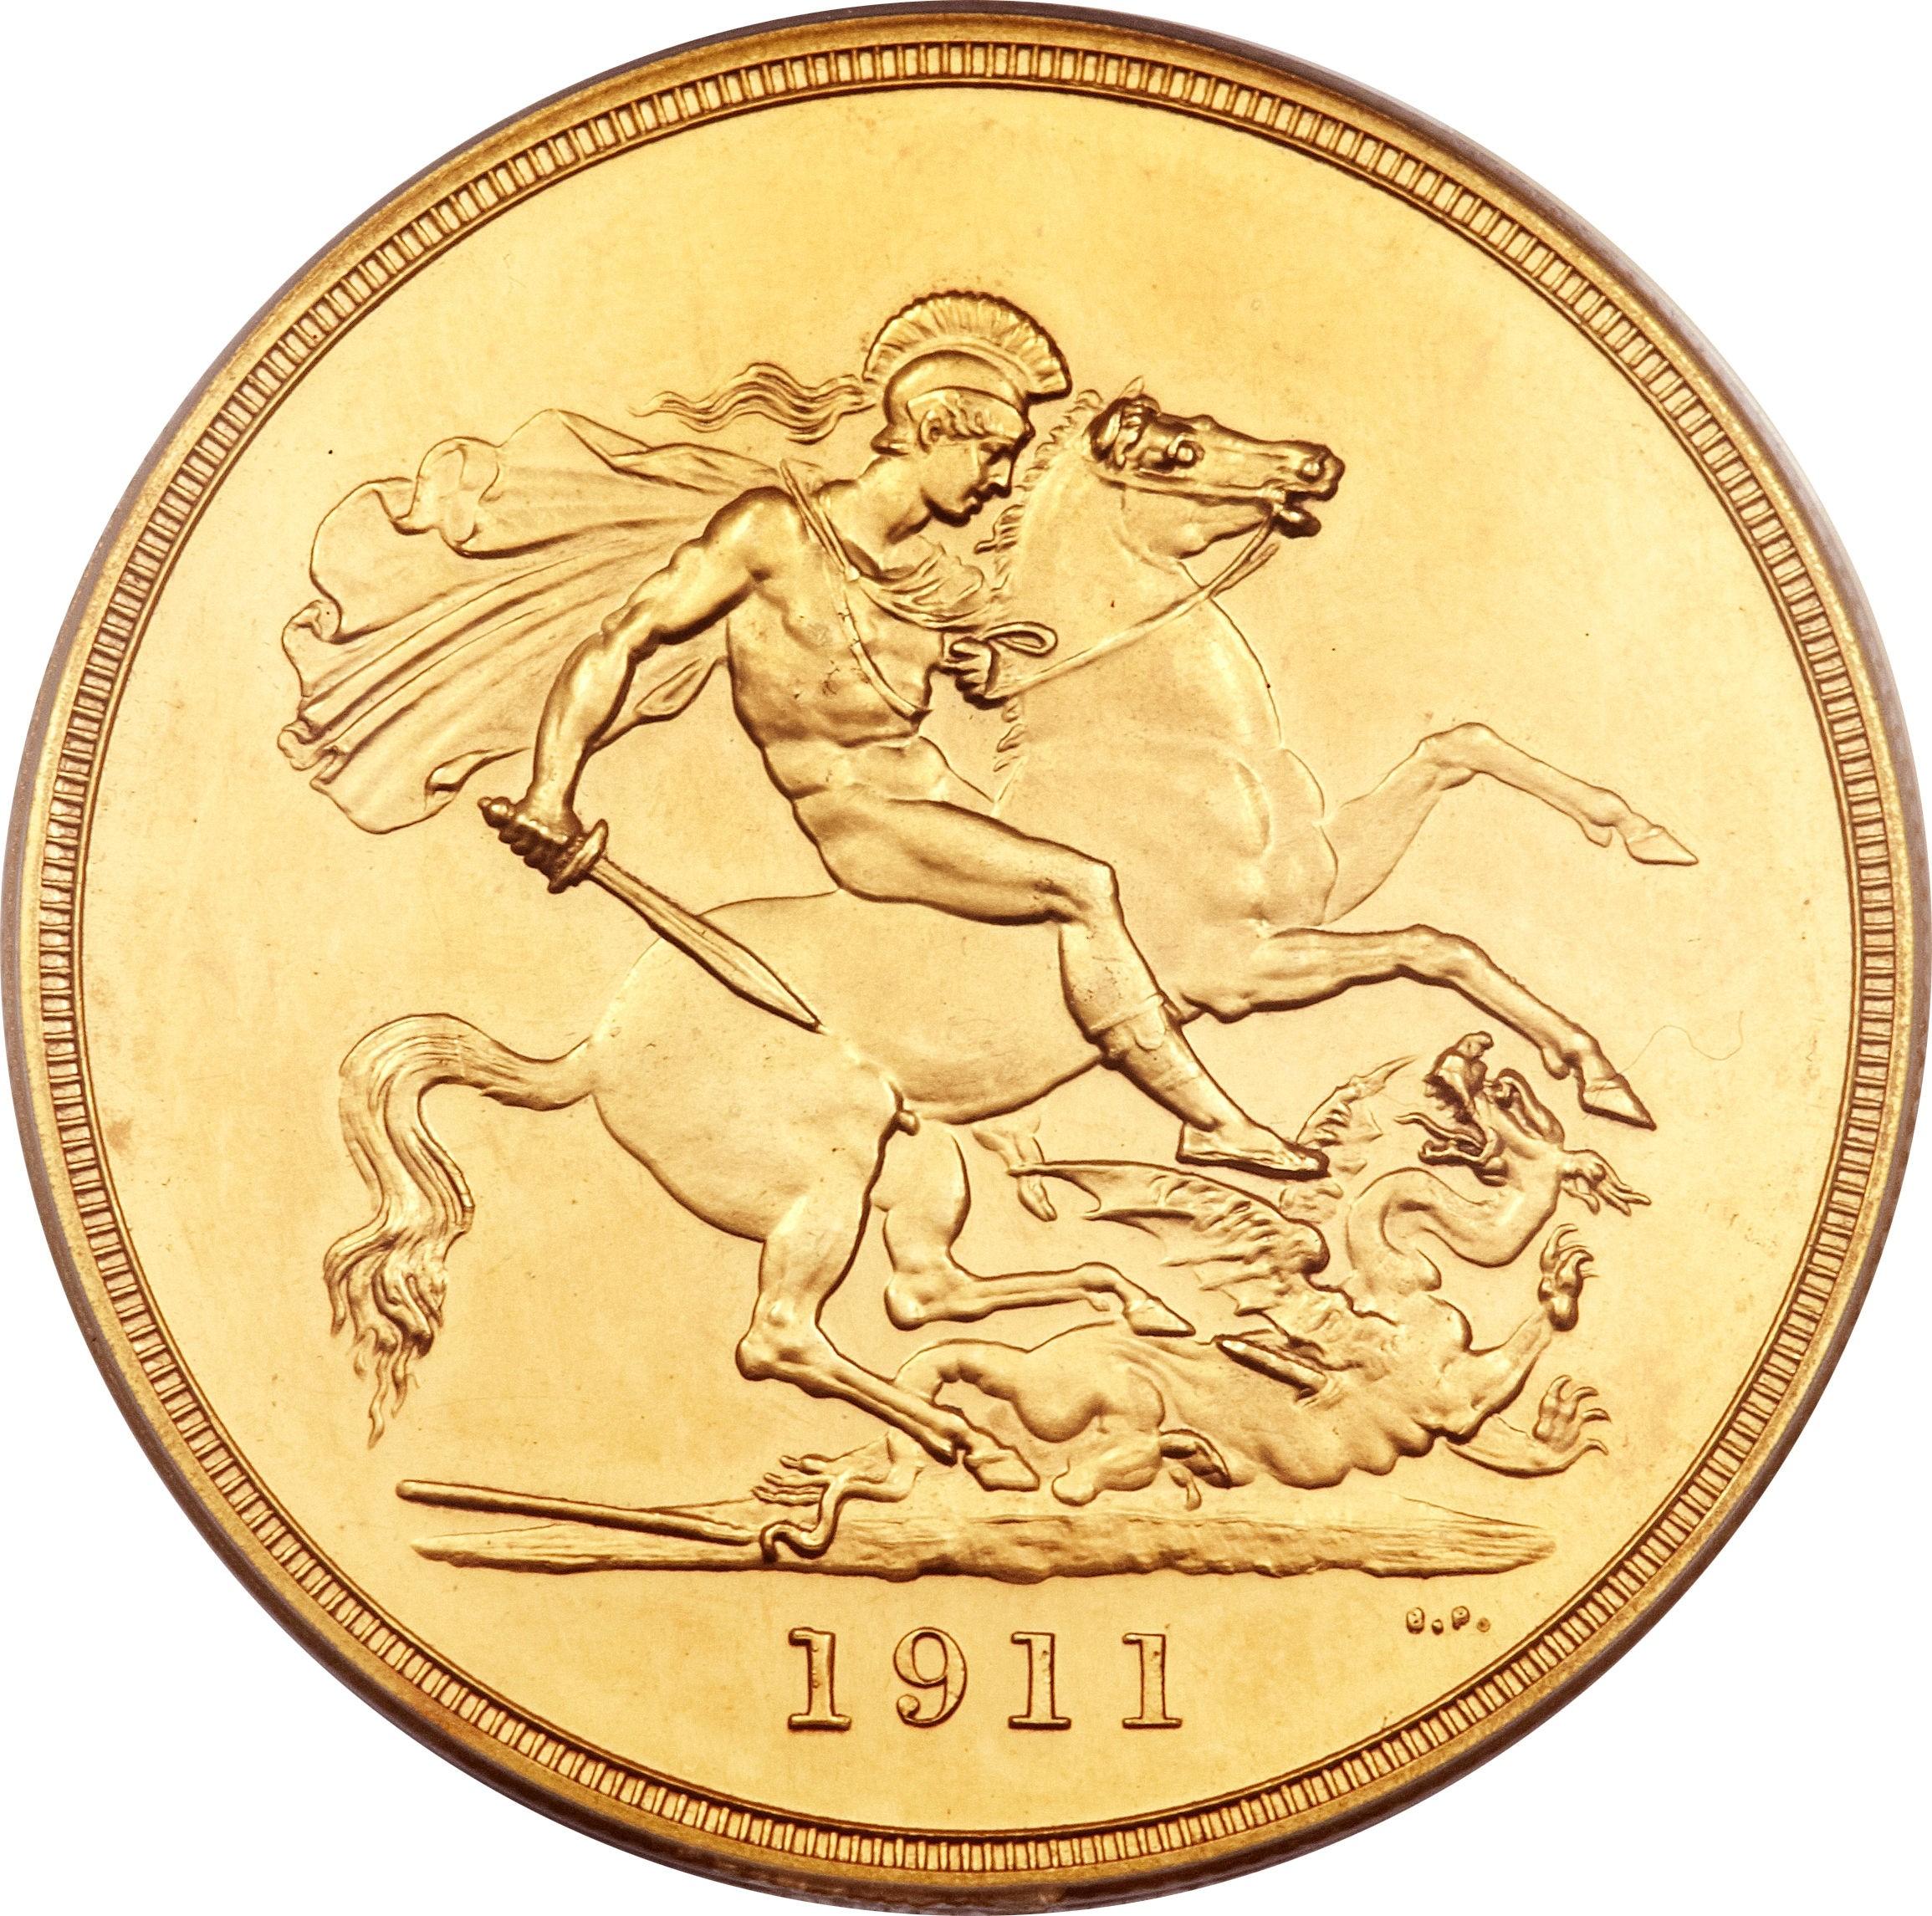 British 5 Pounds (1911 George V)